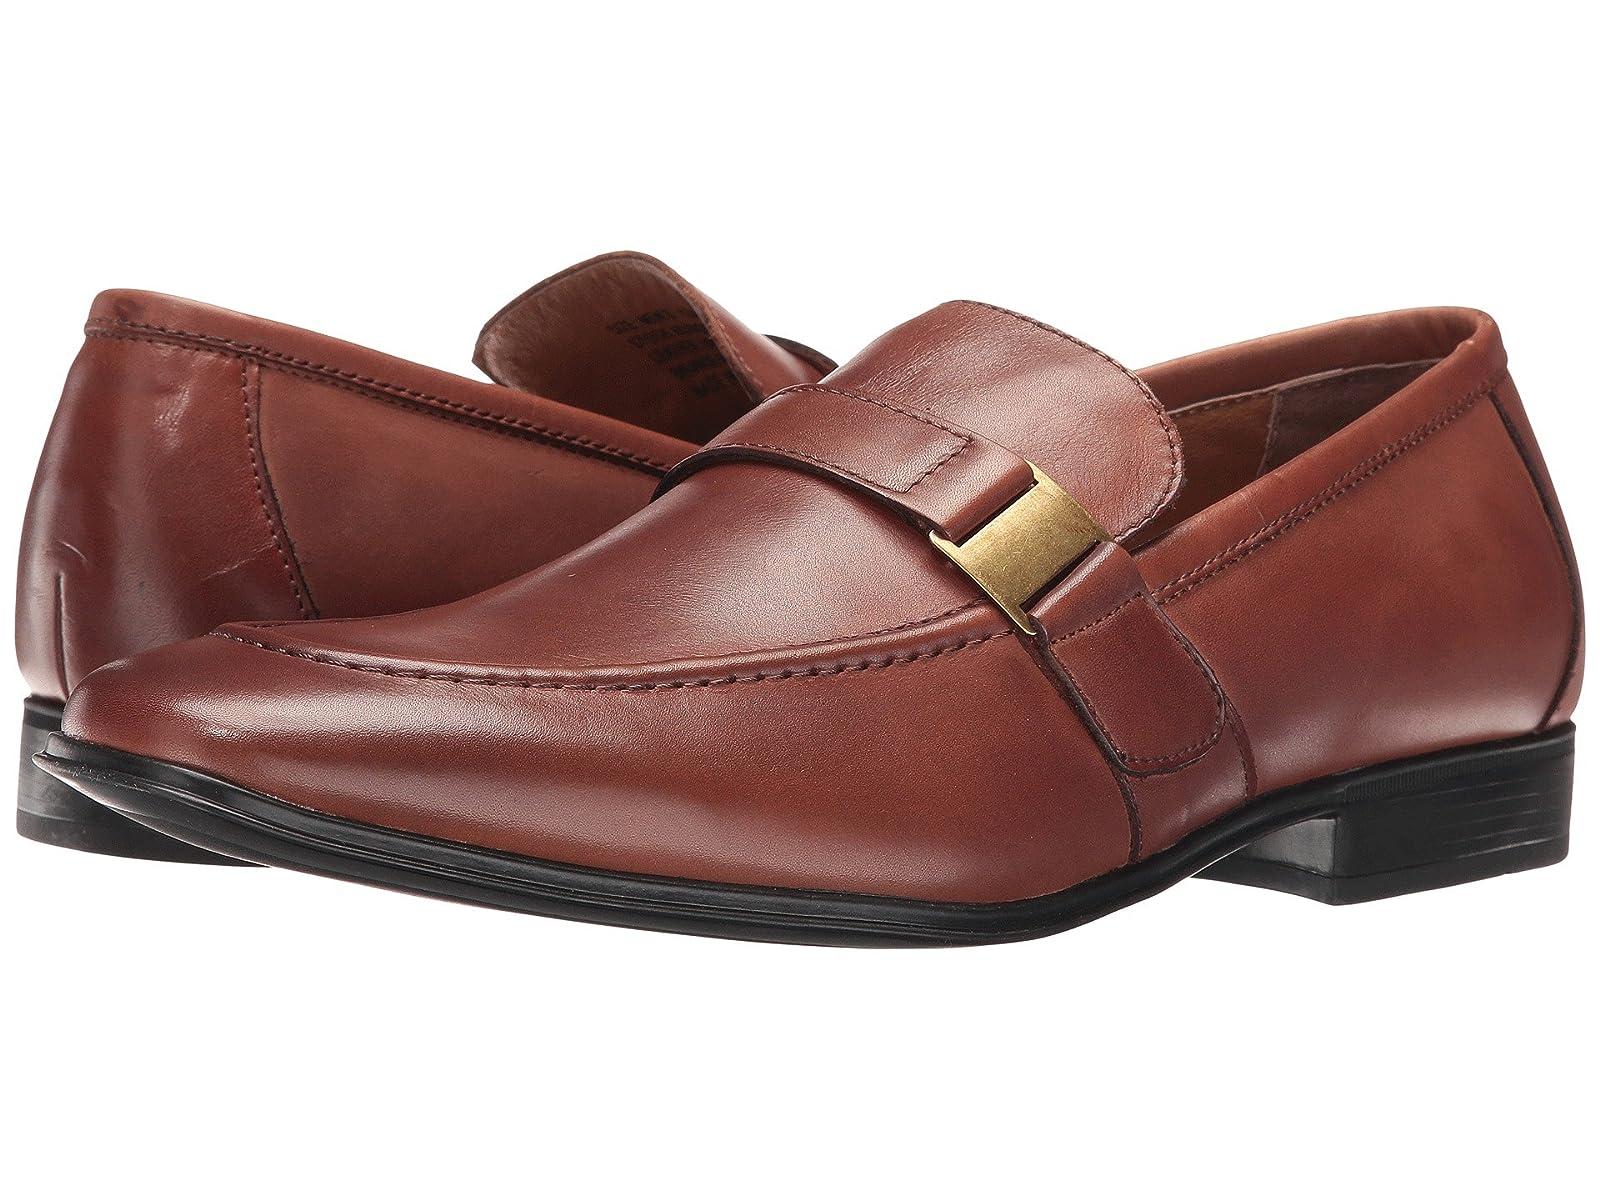 Giorgio Brutini SantosAtmospheric grades have affordable shoes